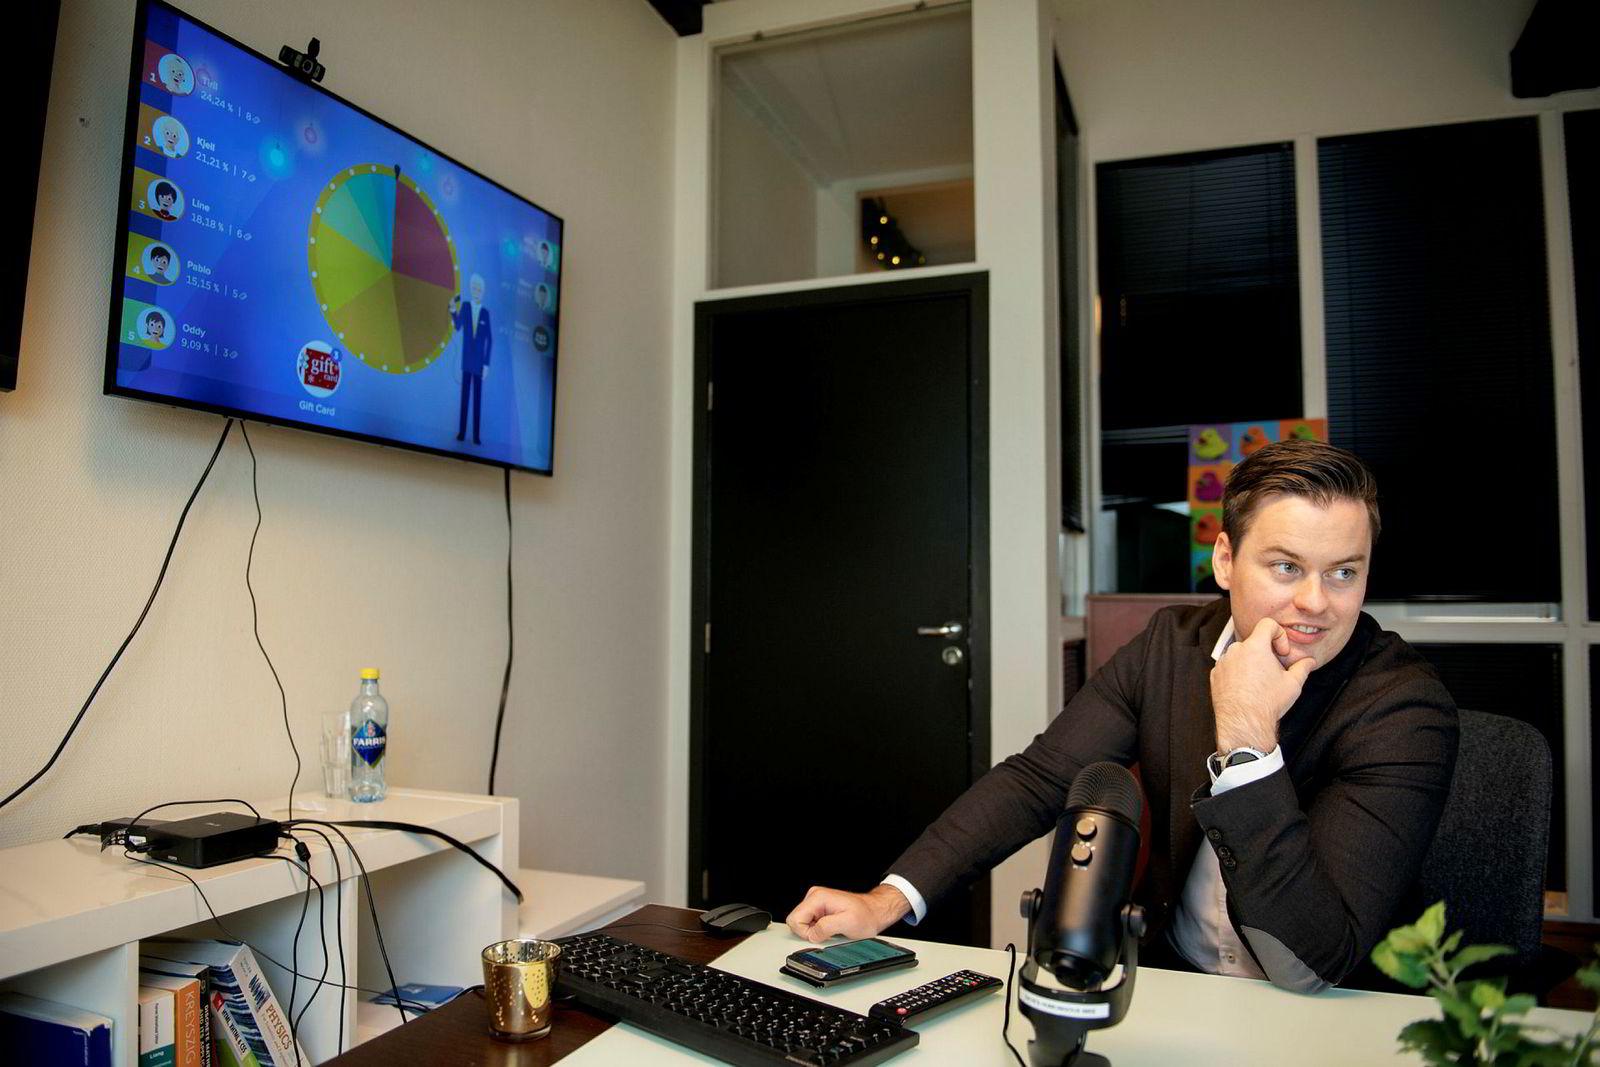 Dogu-gründer Sindre Haaland med deres «Salesscreen» på skjermen oppe til venstre.